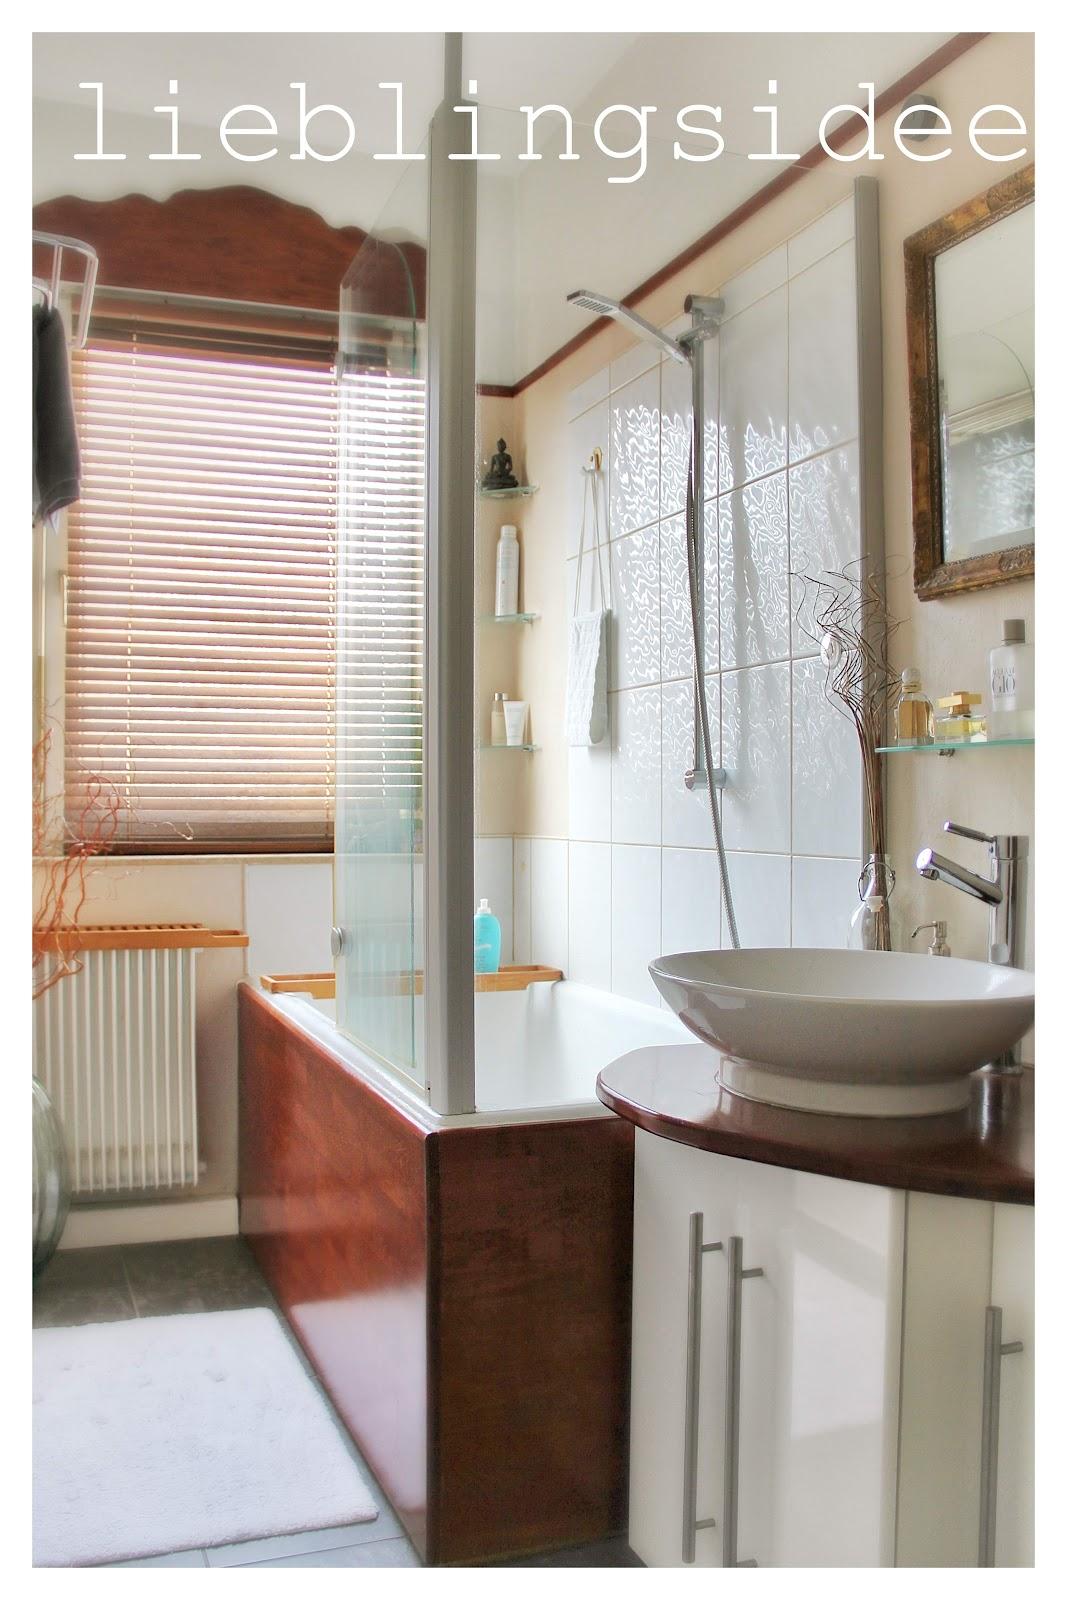 lieblingsidee ein badezimmer im kaj tenlook aus alt. Black Bedroom Furniture Sets. Home Design Ideas